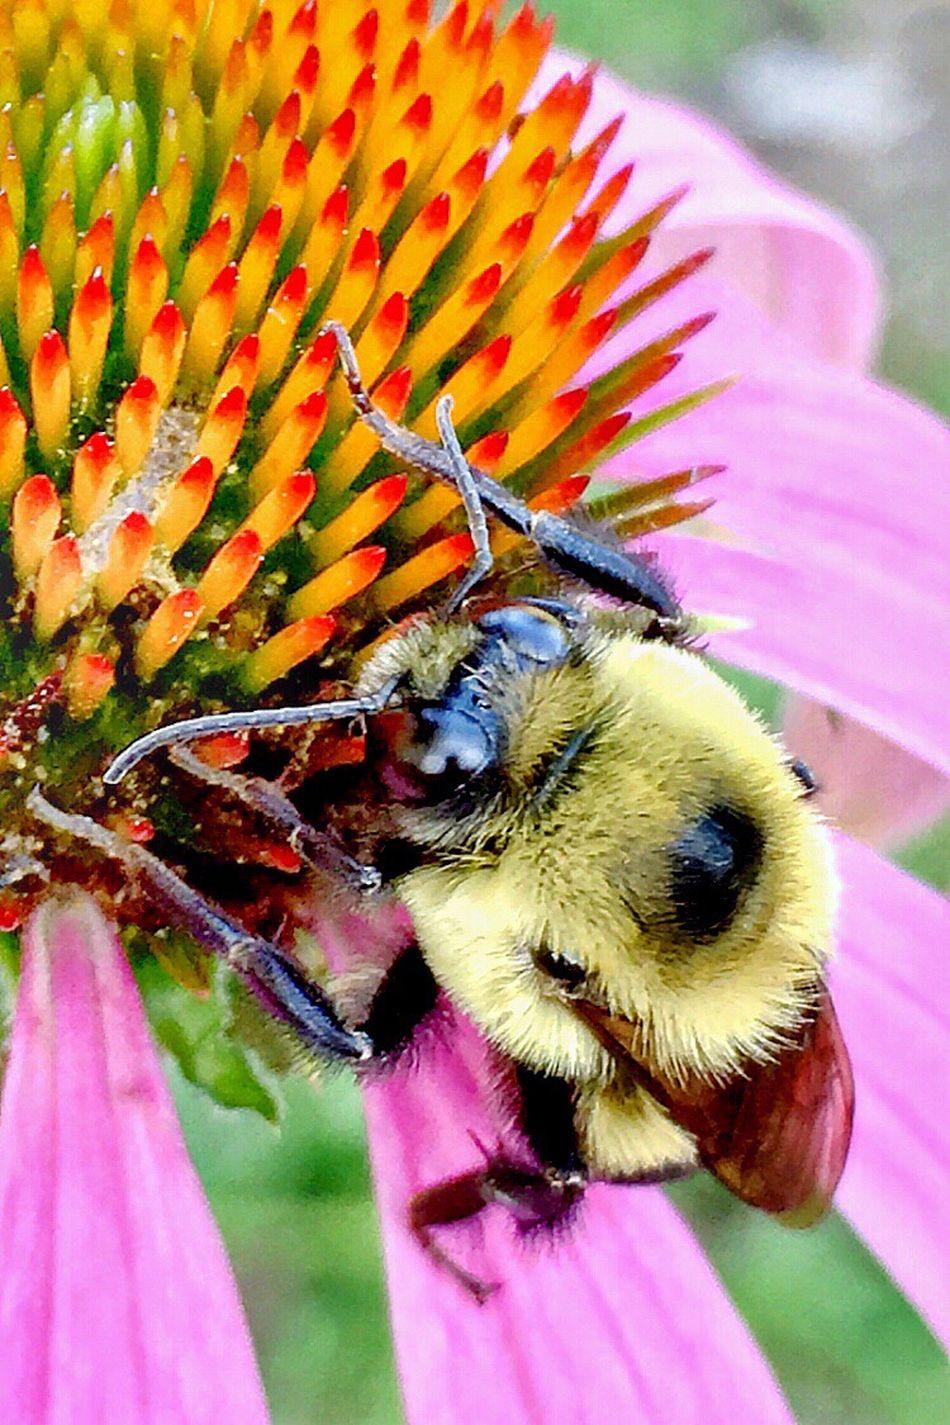 Bumble bee on coneflower. Ip6s, Camera+ Macro, edited in Enlight, Tadaa SLR and Snapseed. First Eyeem Photo